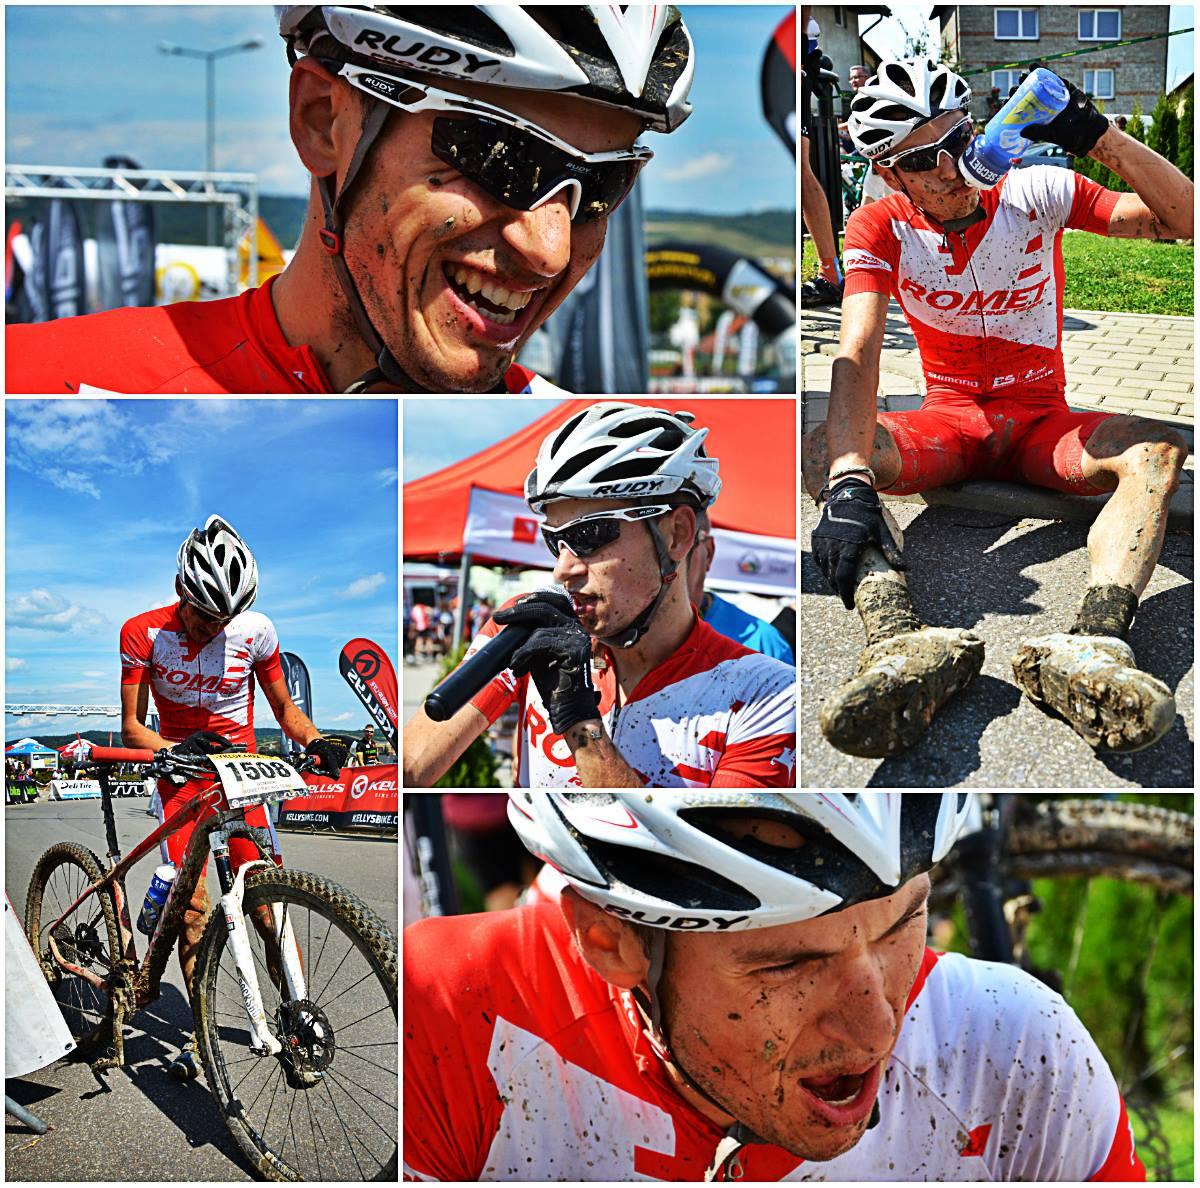 Dominik Grządziel (Romet Racing Team) - Cyklokarpaty, Dukla 2016 1